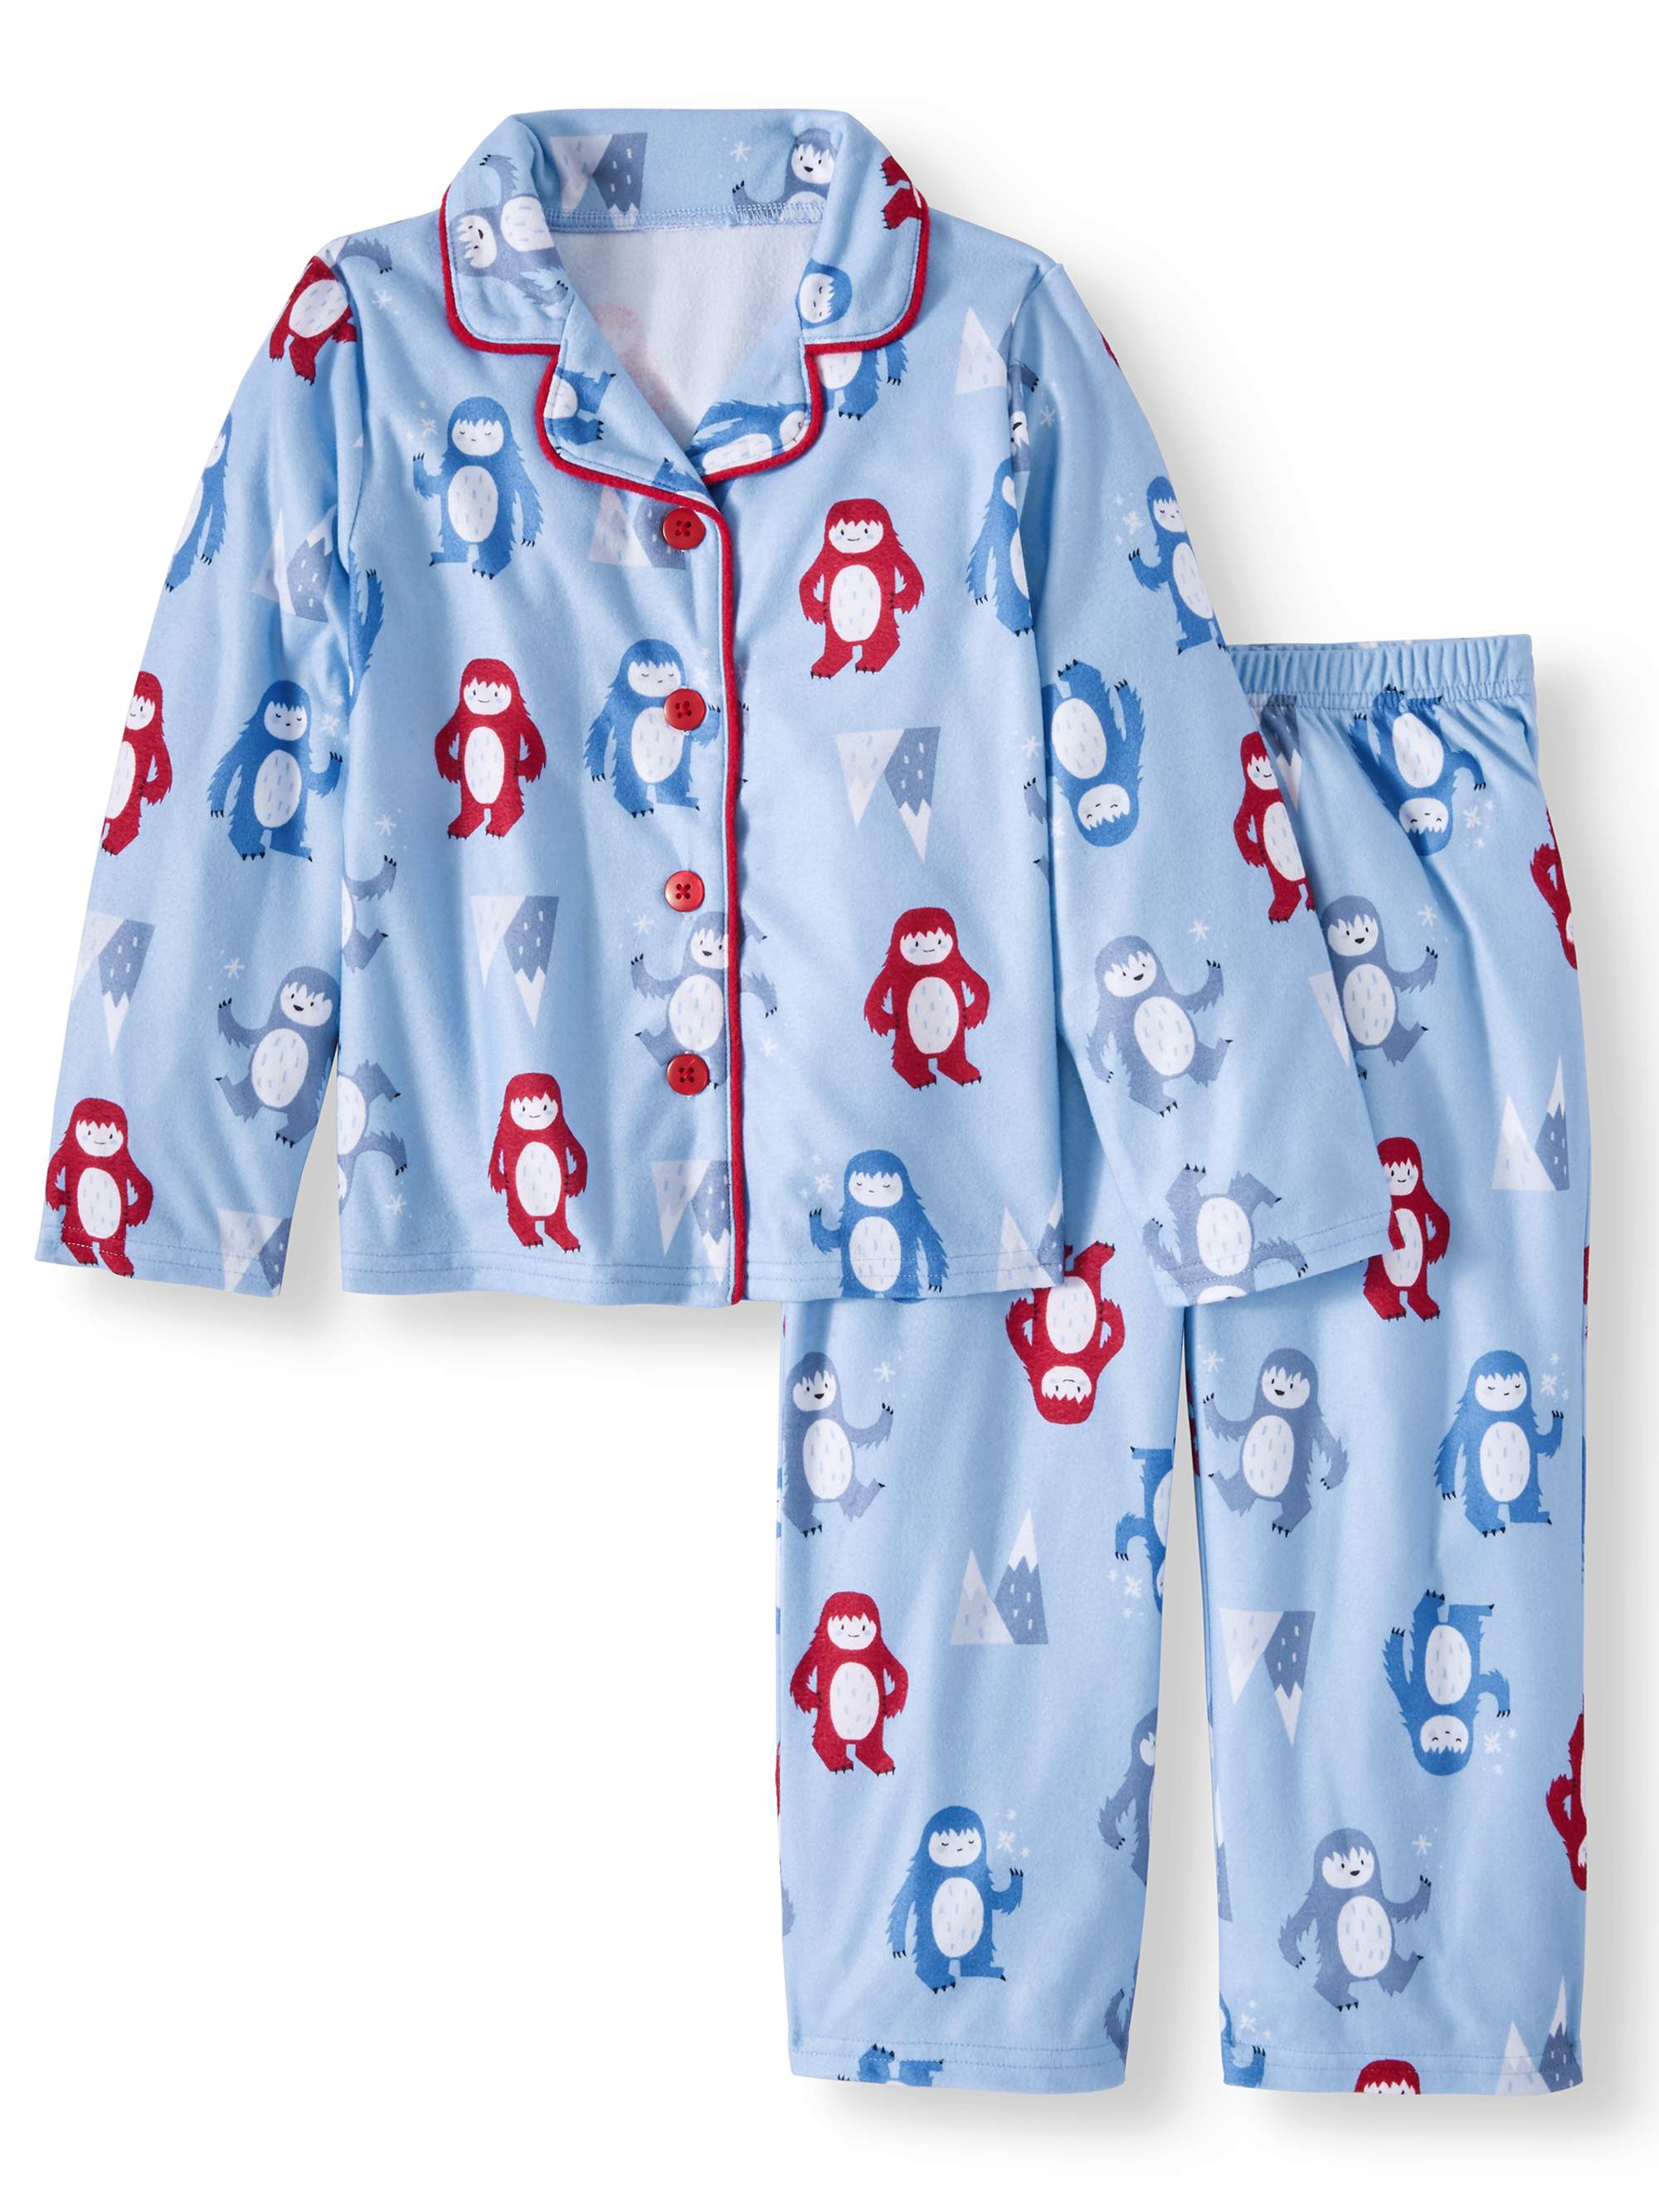 Toast & Jammies Holiday Family Sleep Yeti Notch Collar Pajamas, 2-piece Set (Toddler Boys or Toddler Girls Unisex)